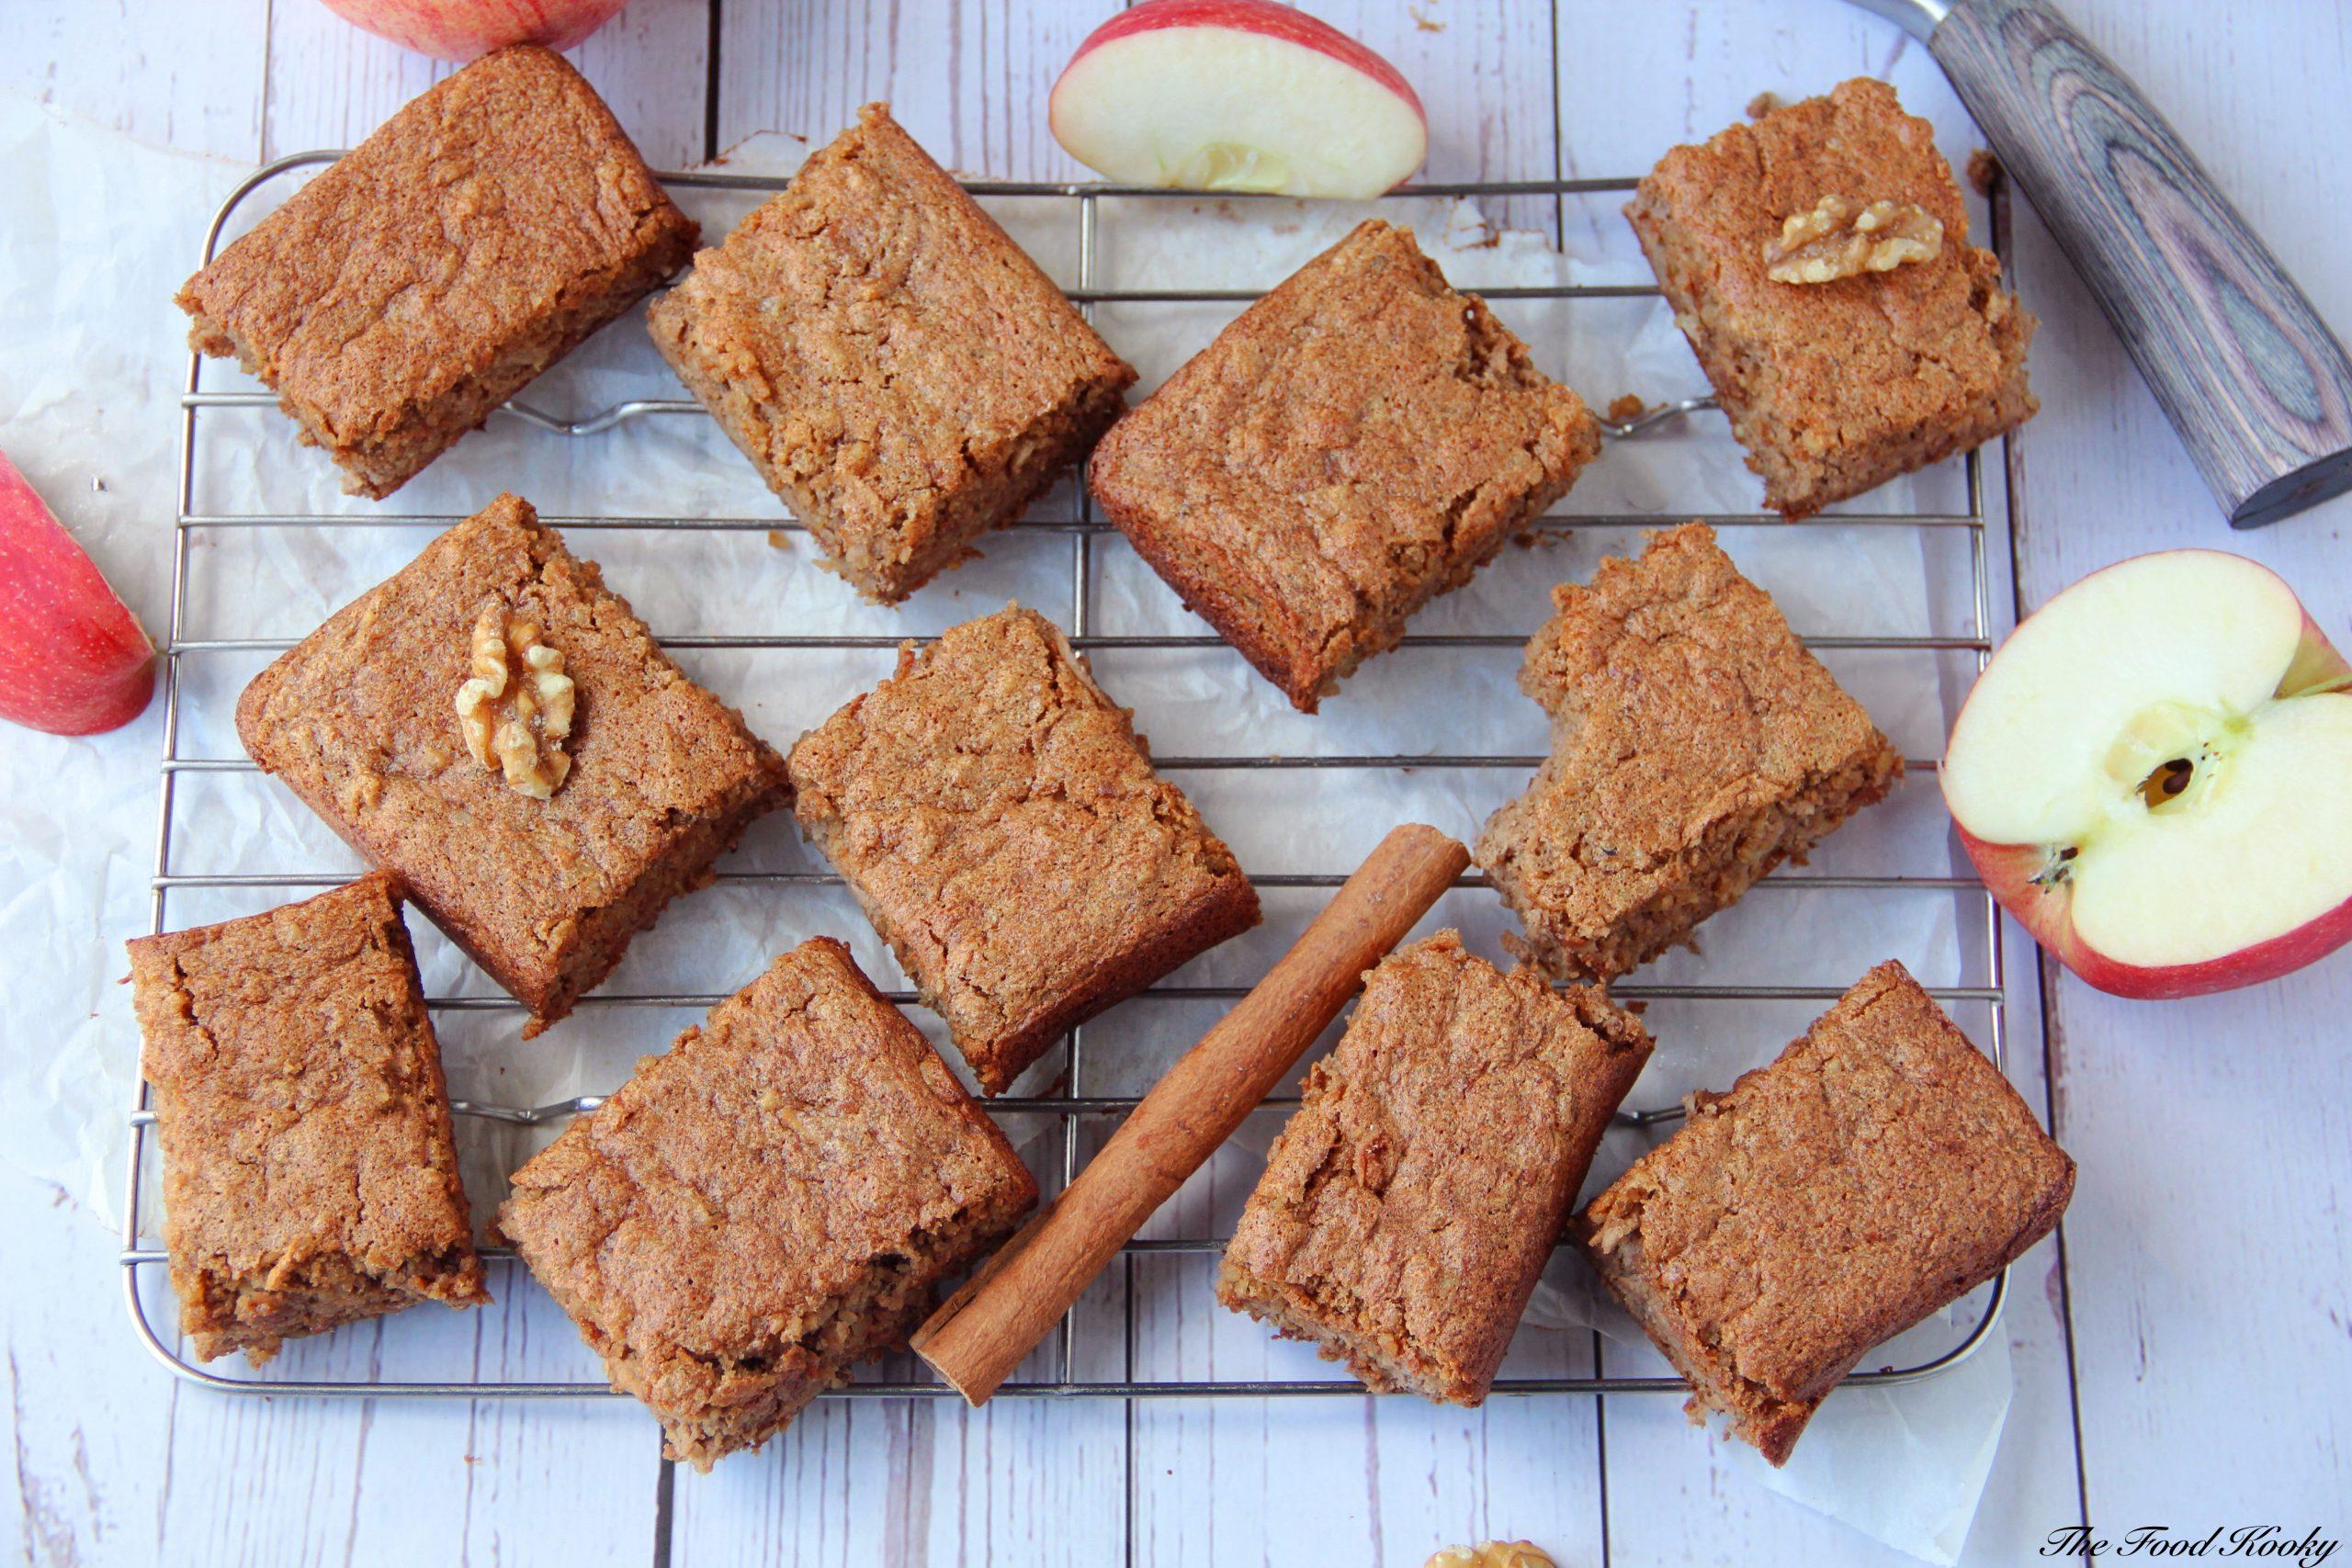 Flourless Walnut Cake with Apples and Cinnamon (Gluten Free)